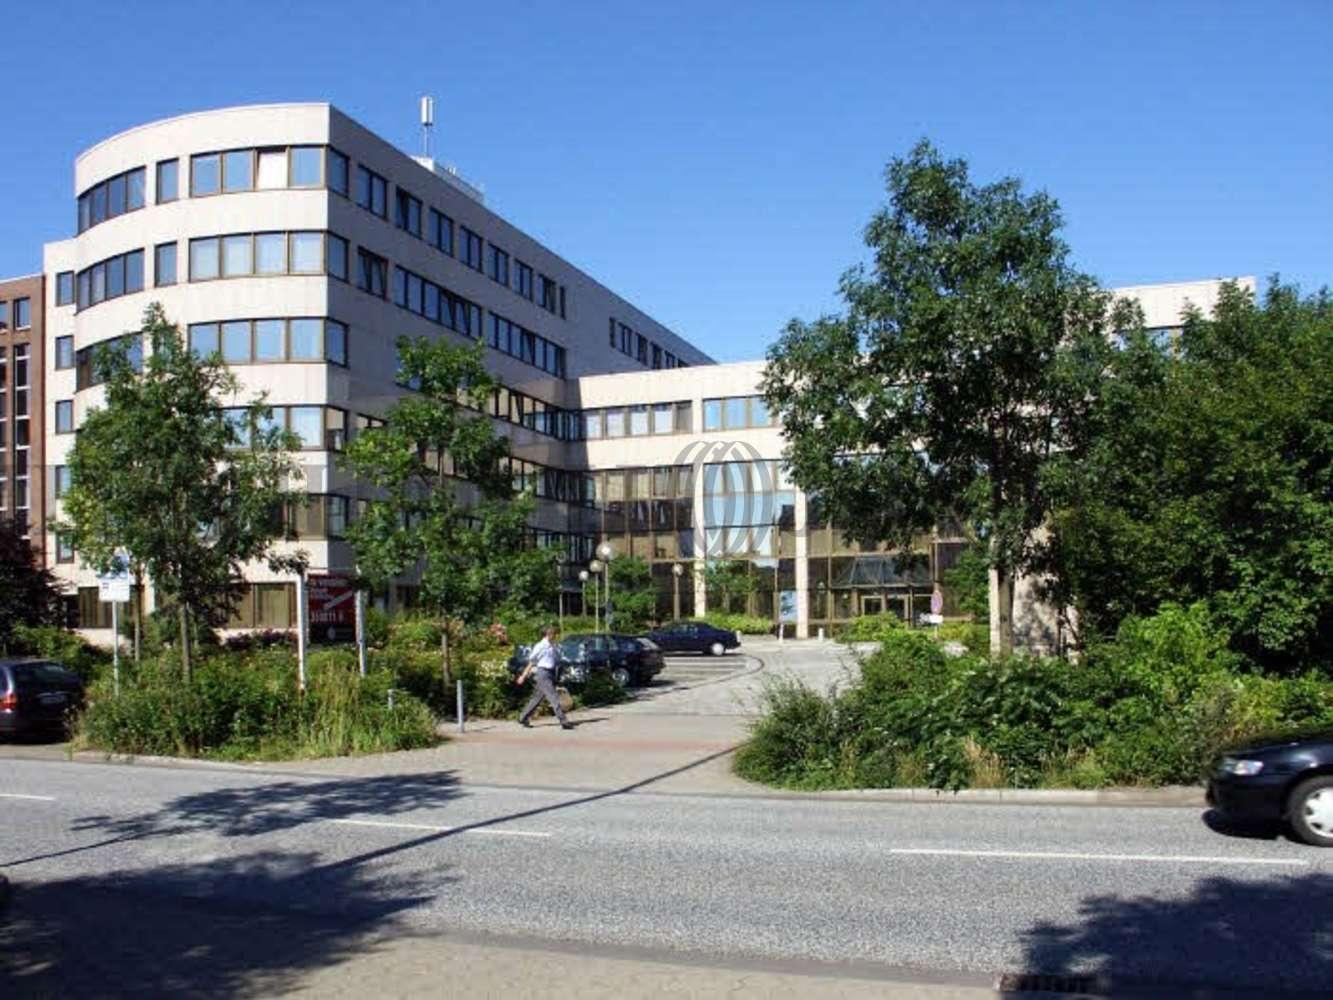 Büros Hamburg, 20097 - Büro - Hamburg, Hammerbrook - H0085 - 9491625